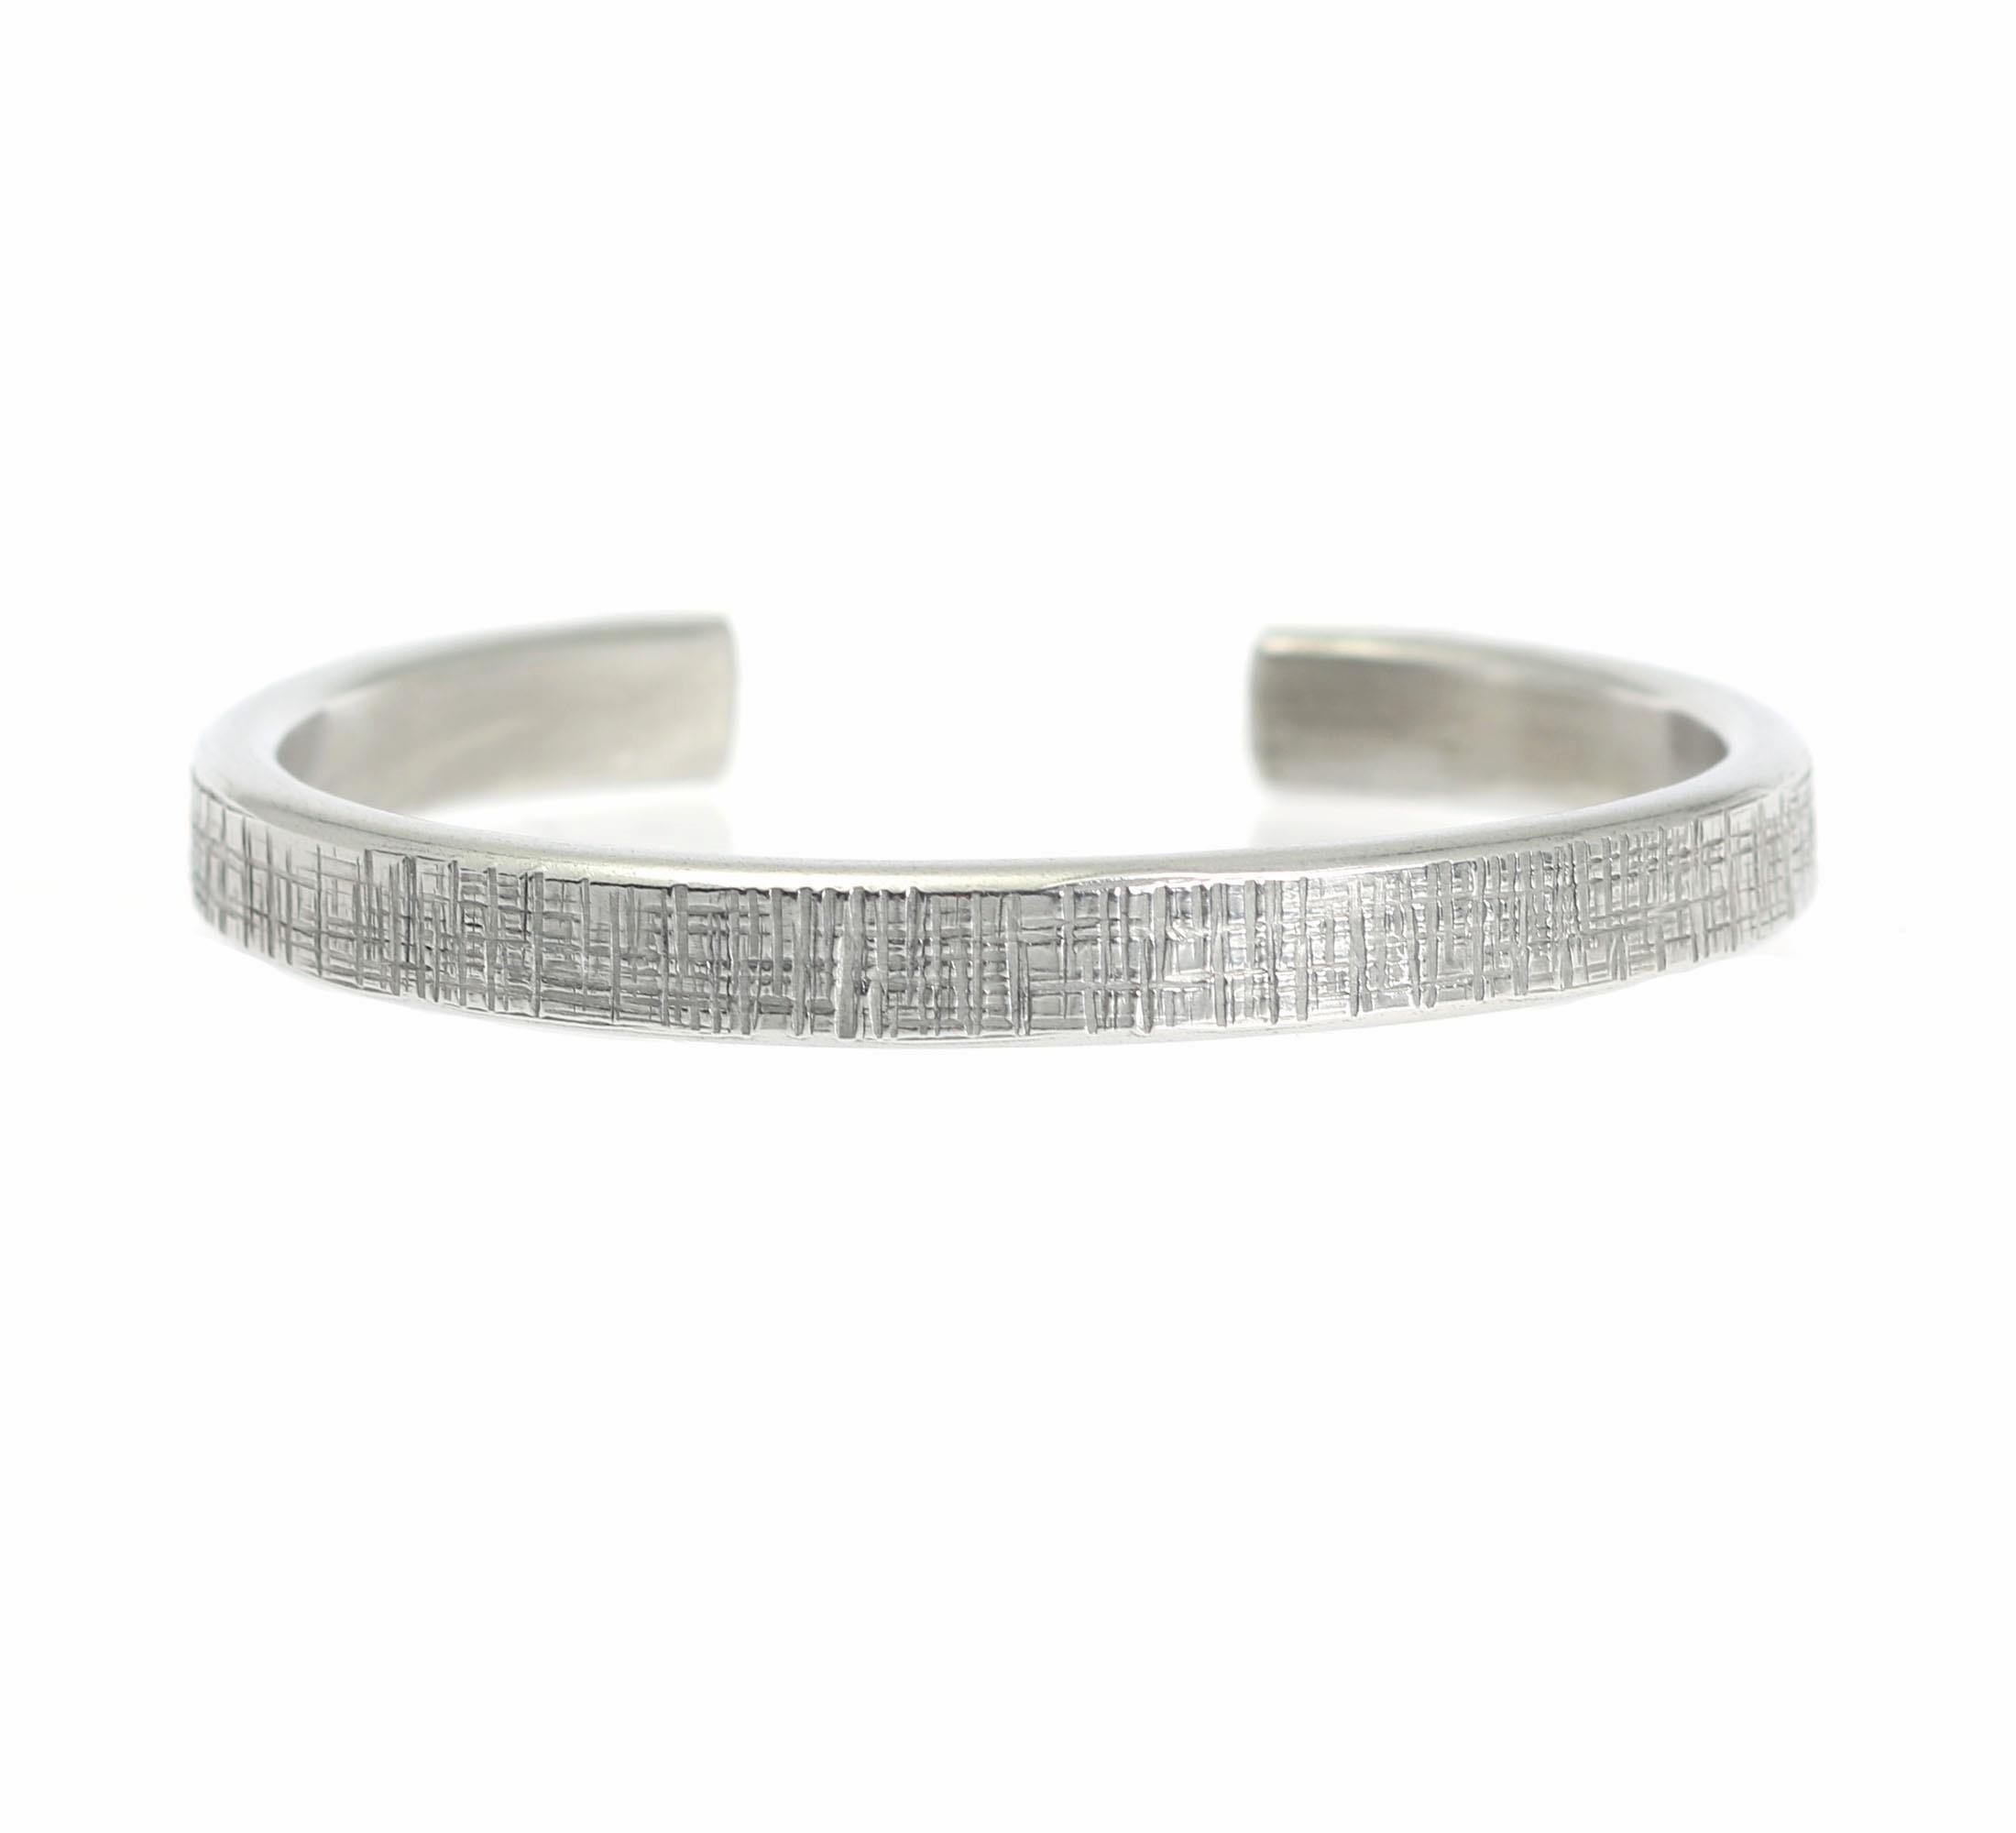 New! Top 7mm Thin Linen Silver Tone Cuff Bracelet Presented on #AmazonHandmade #Cuffs http://www.amazon.com/dp/B01AIS7DBM